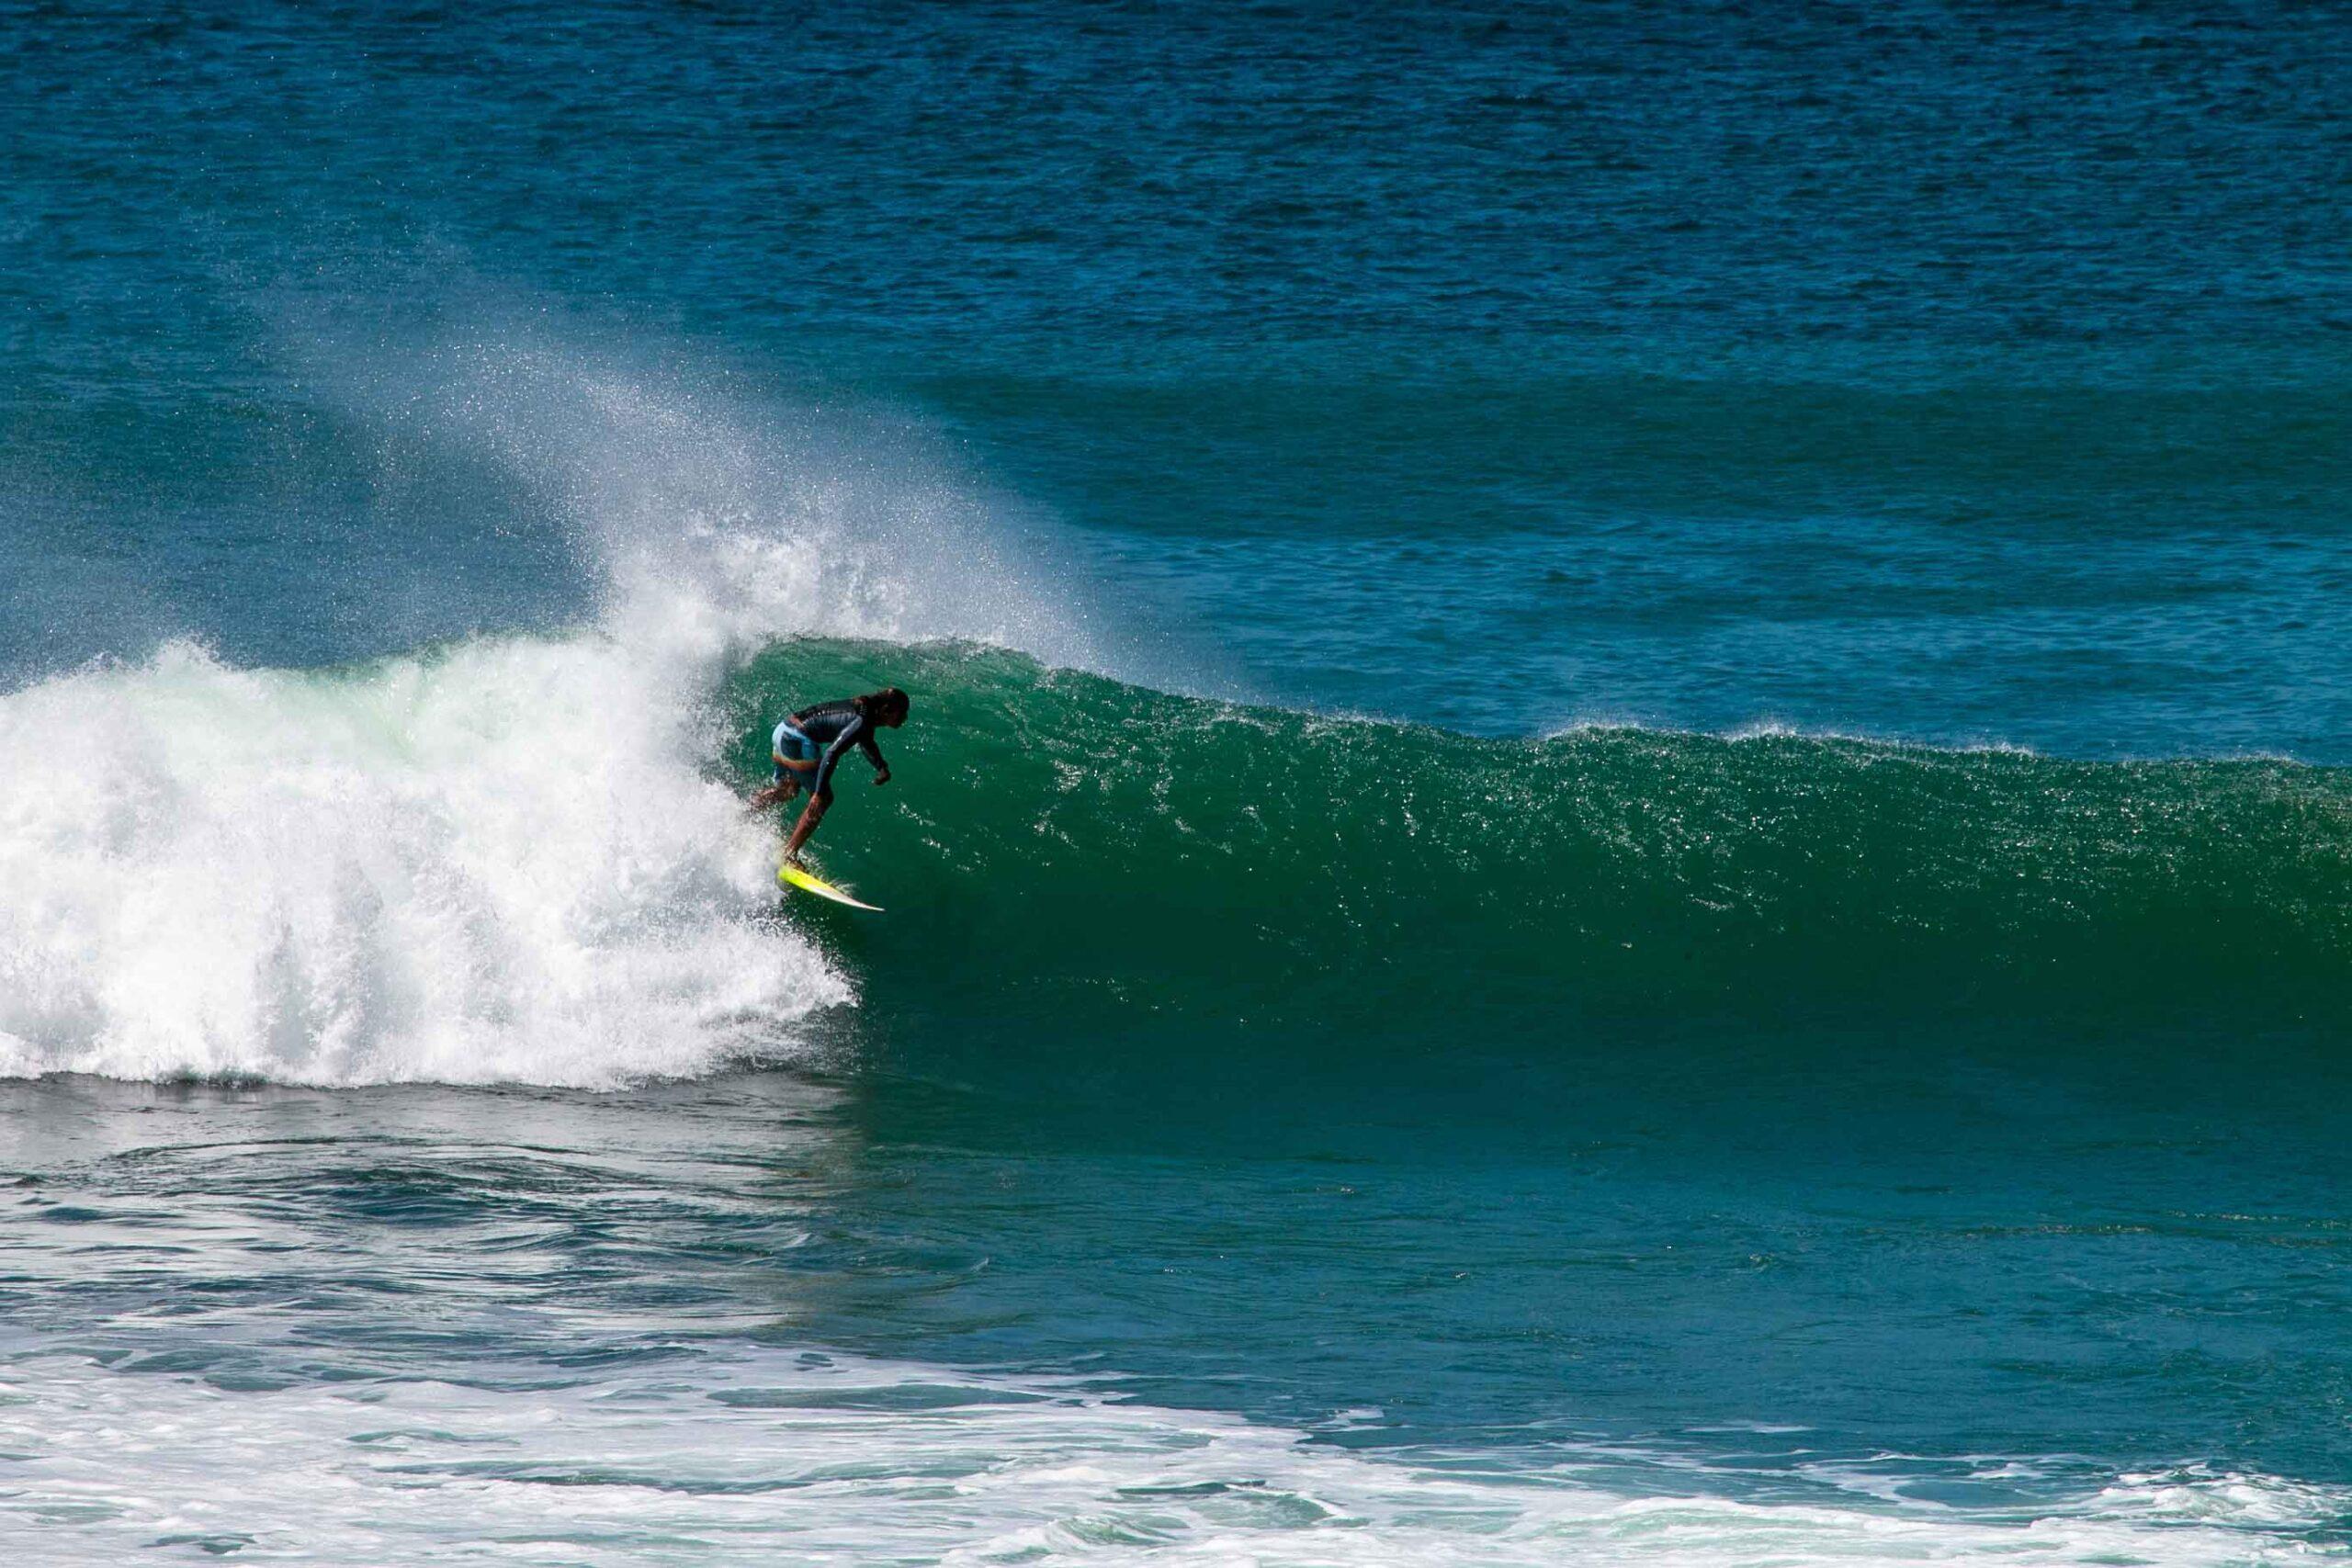 Surfing Popoyo beach Southern Nicaragua